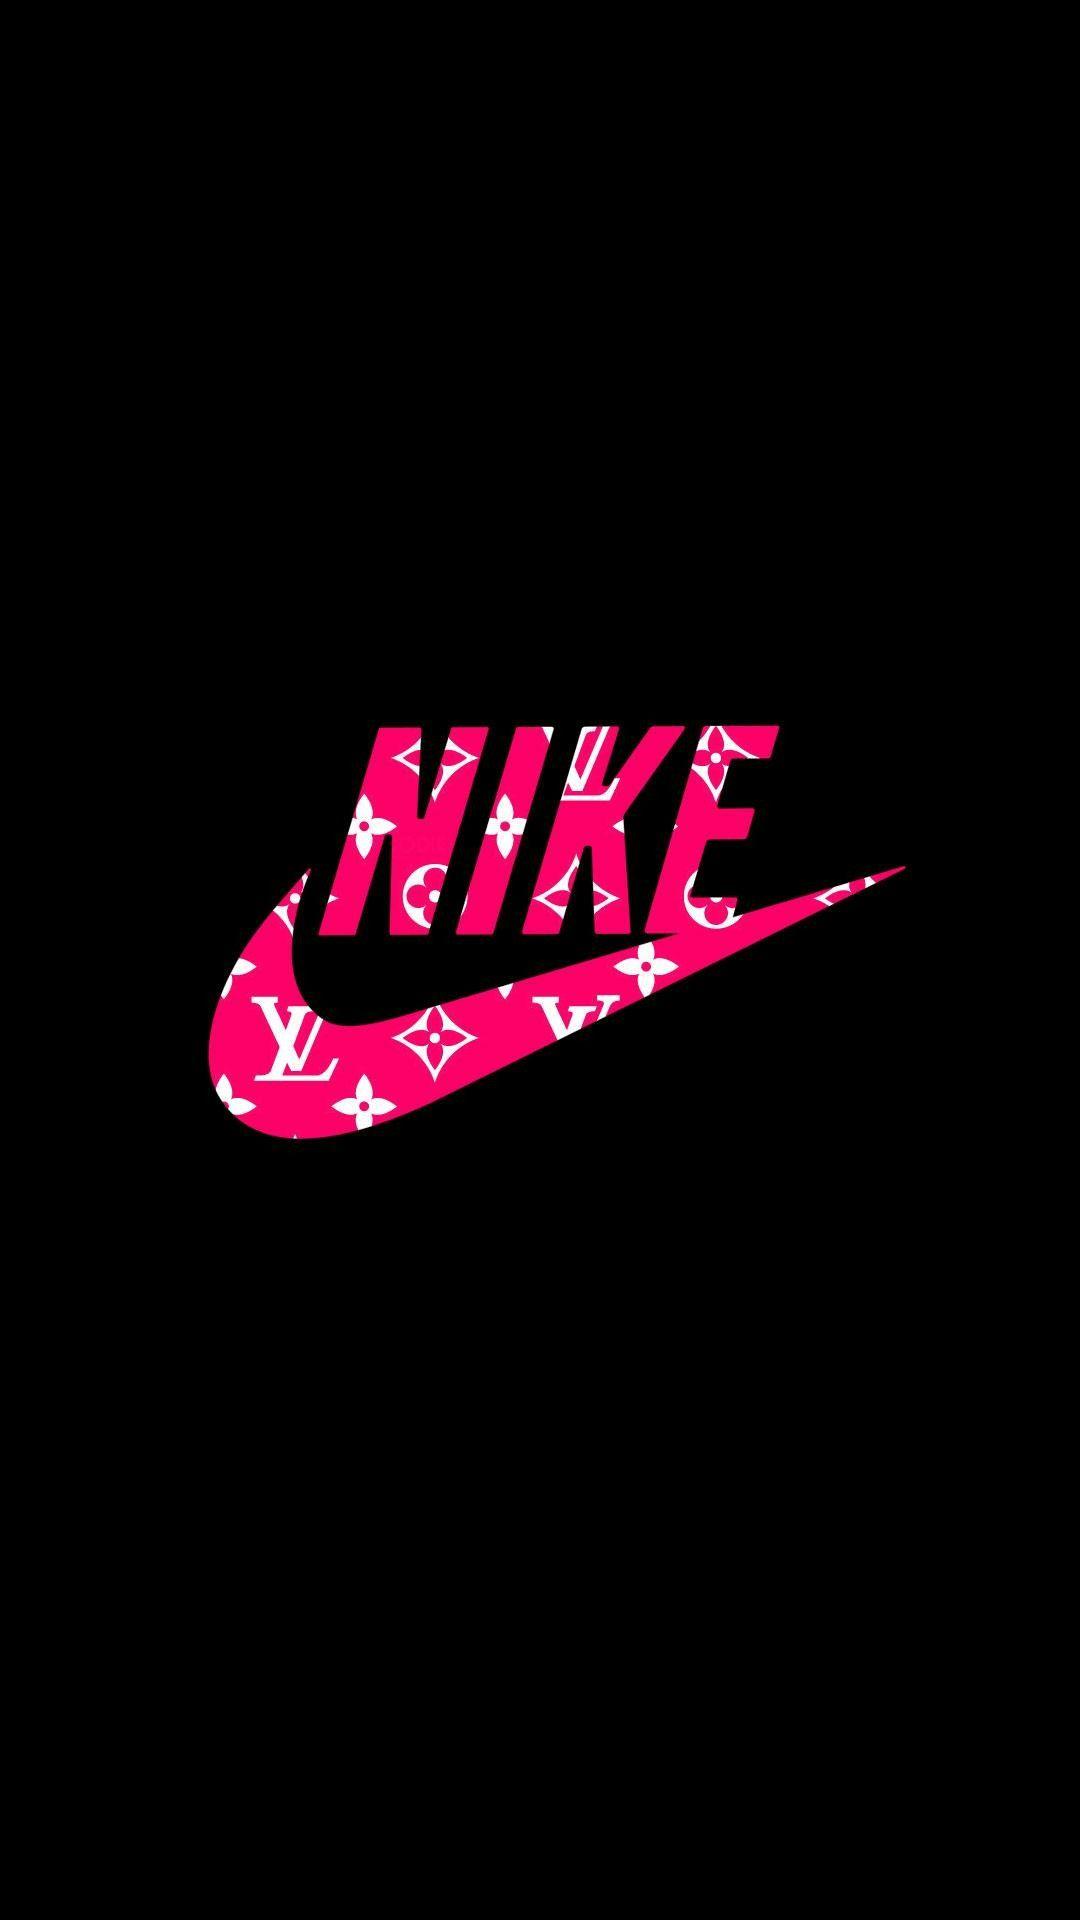 Nike Louis Vuitton Wallpaper Background Wallpaper Hd In 2019